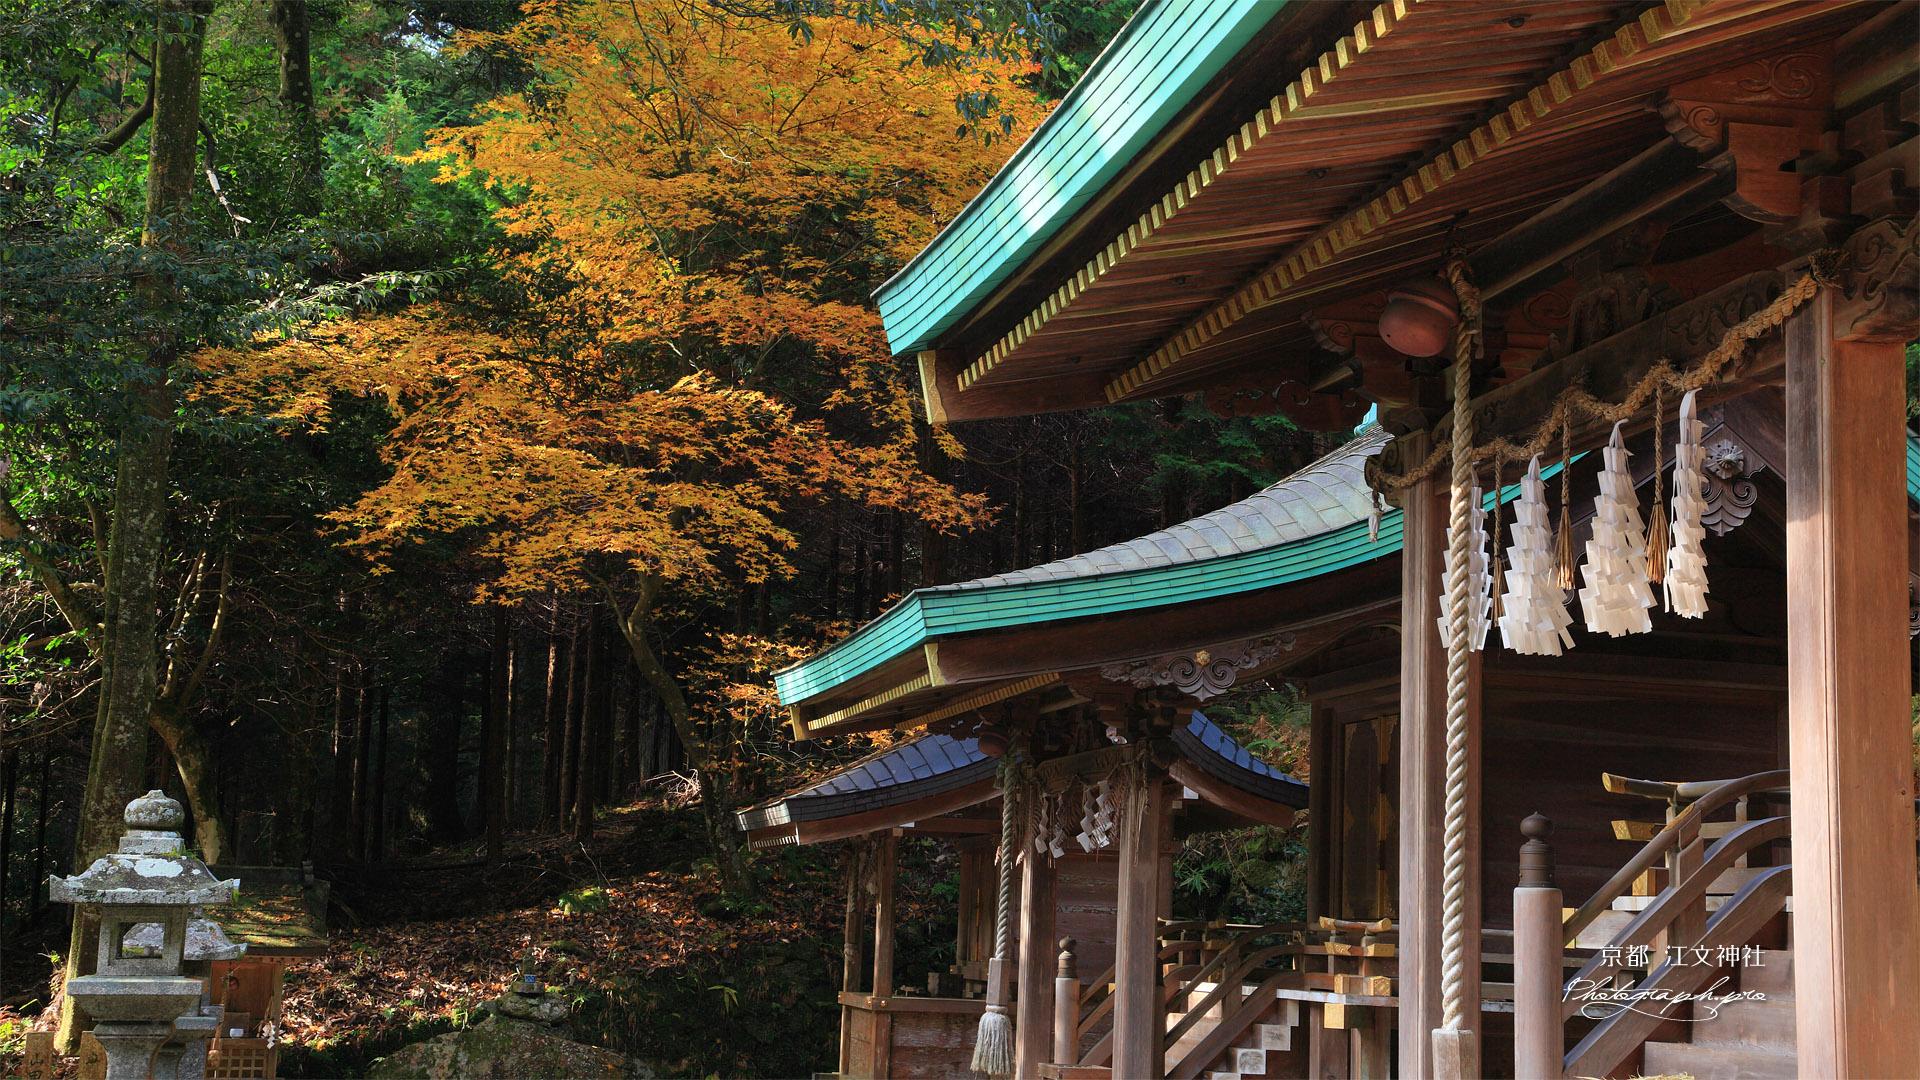 江文神社 社殿と紅葉